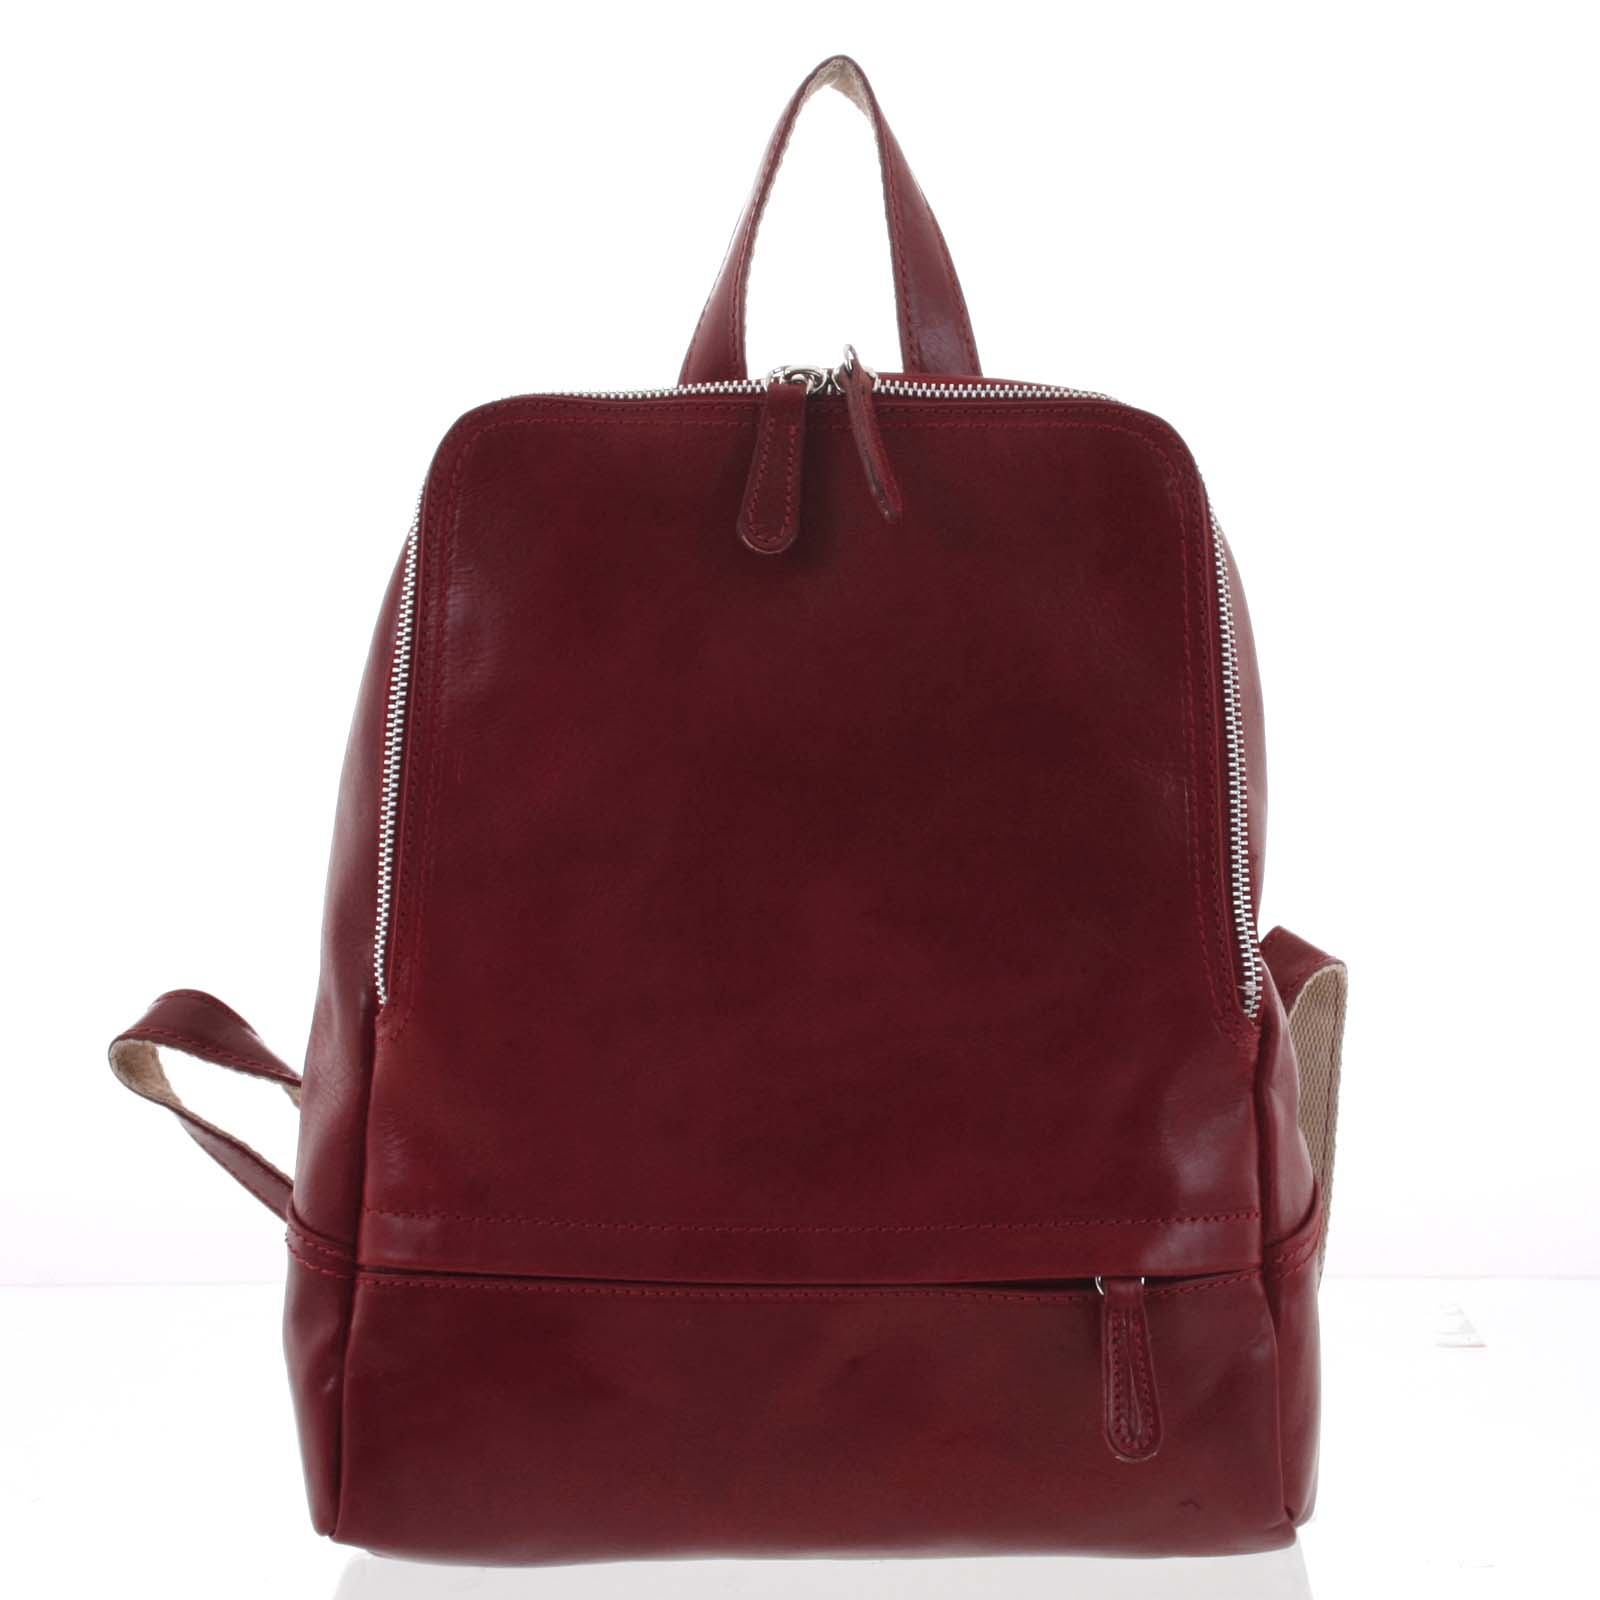 Dámský kožený batůžek červený - ItalY Zeus